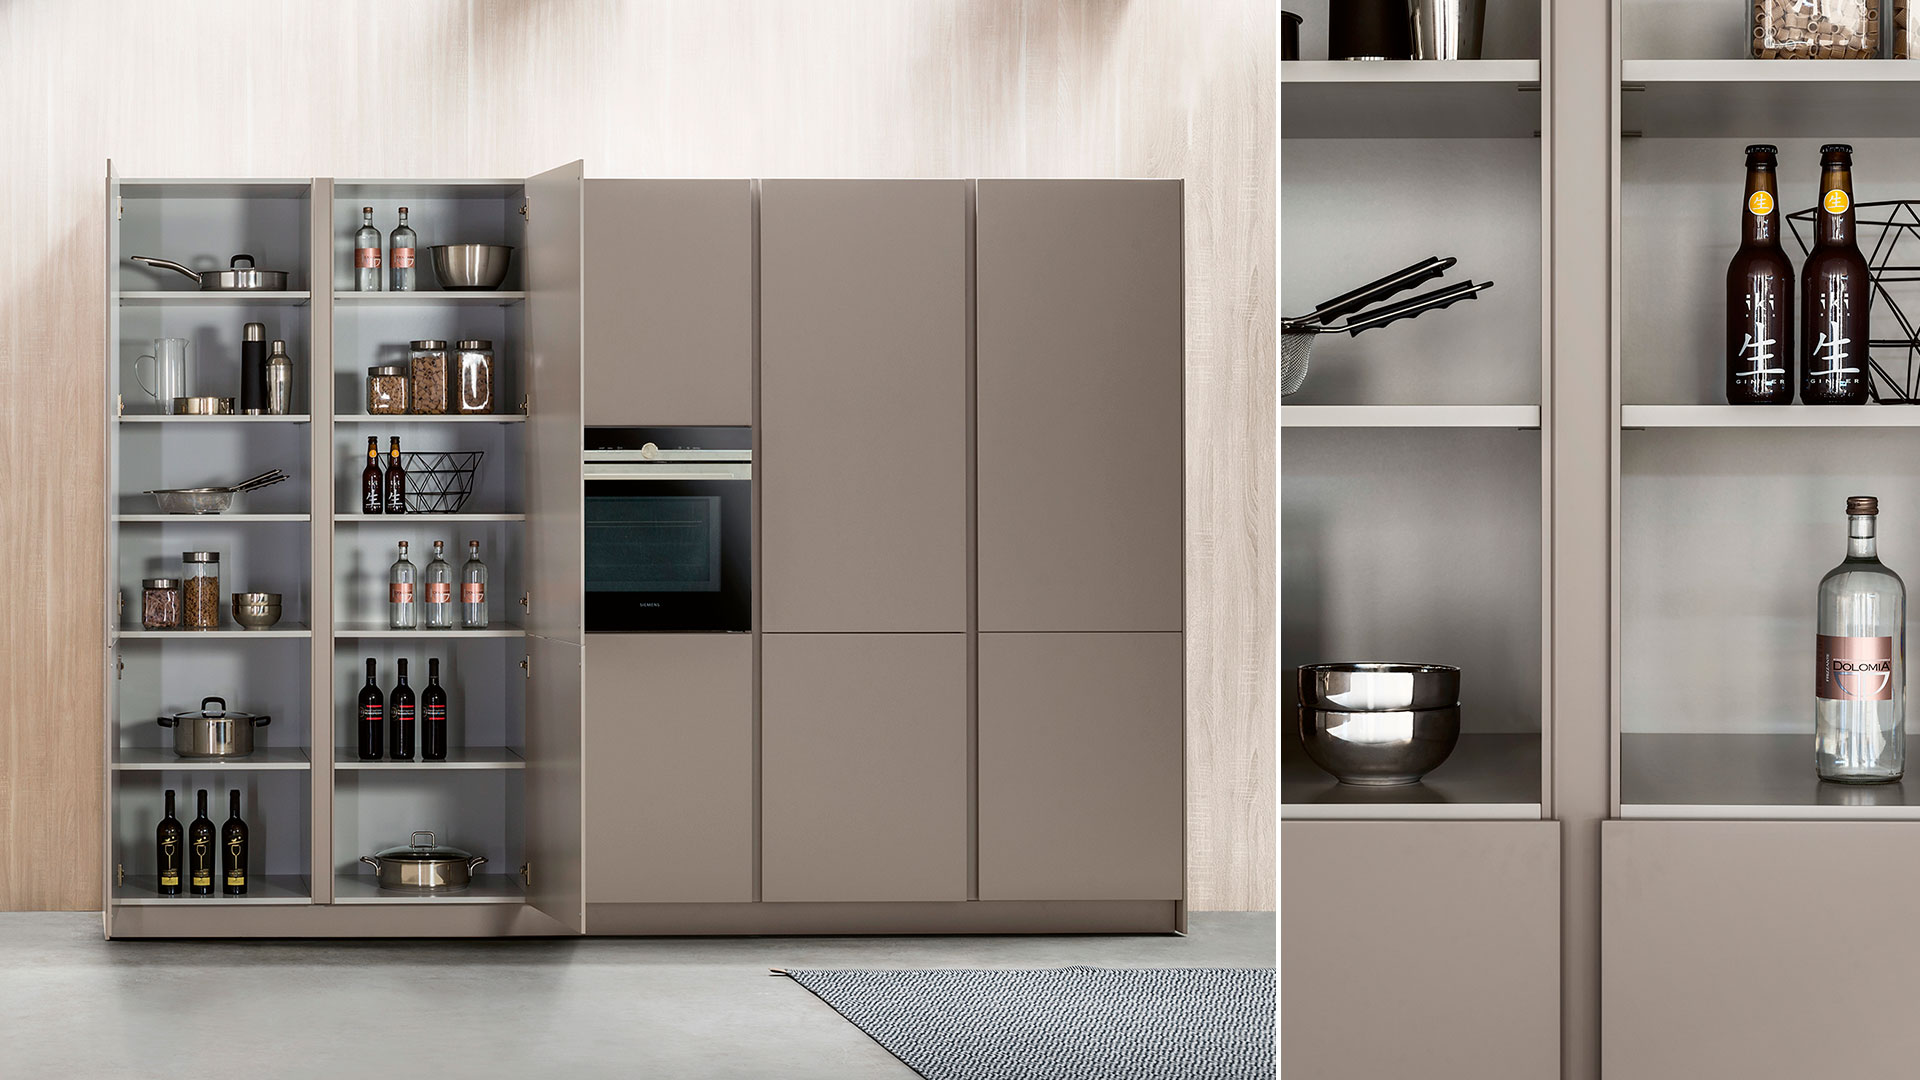 Cucina moderna freestanding in corian K6 | Collezioni Cucine 2018 TM Italia - TM_CAT_K6_002